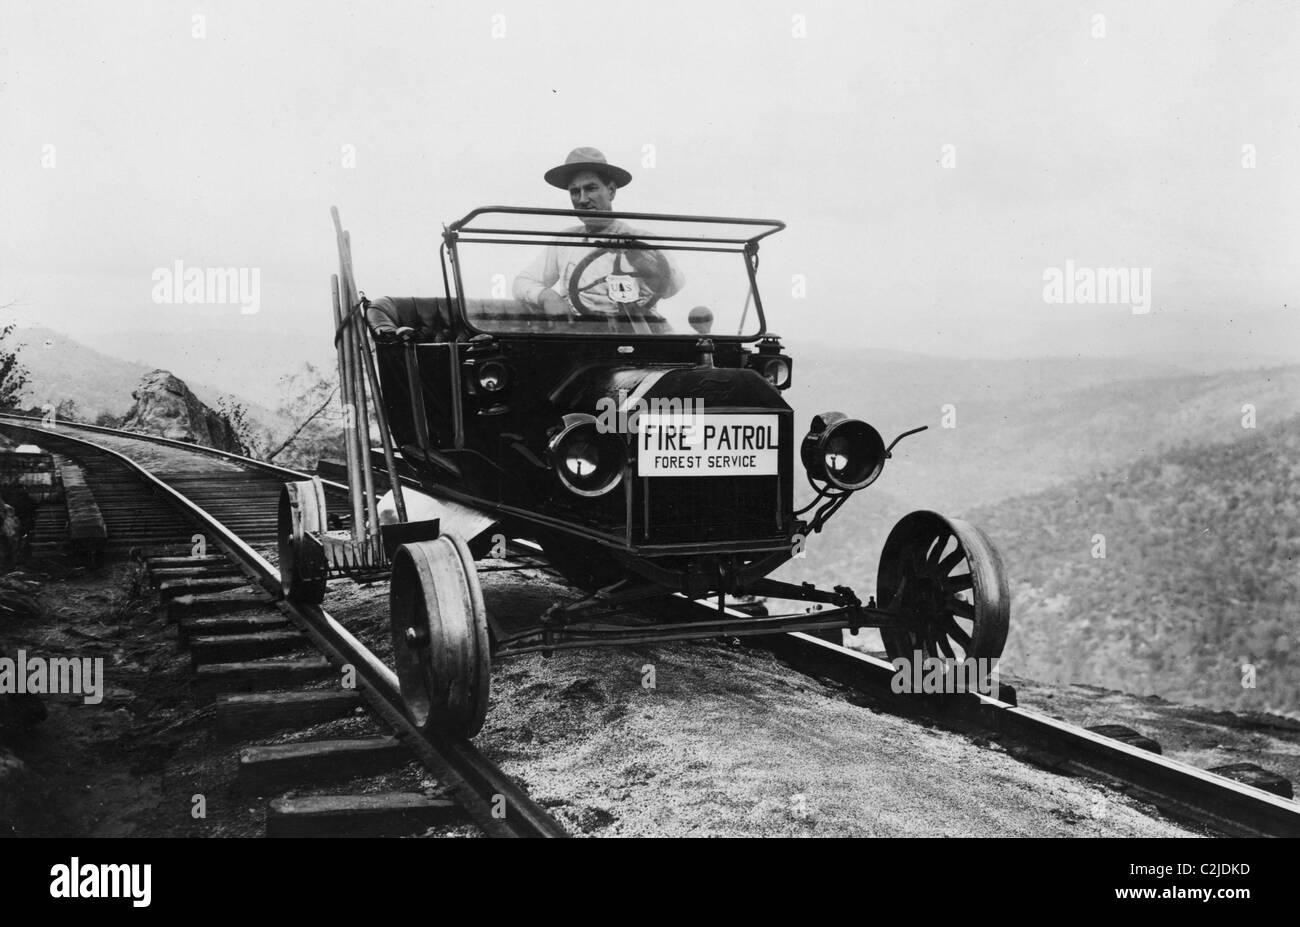 Fire Patrol Rides Steel wheeled car over Railroad Tracks - Stock Image